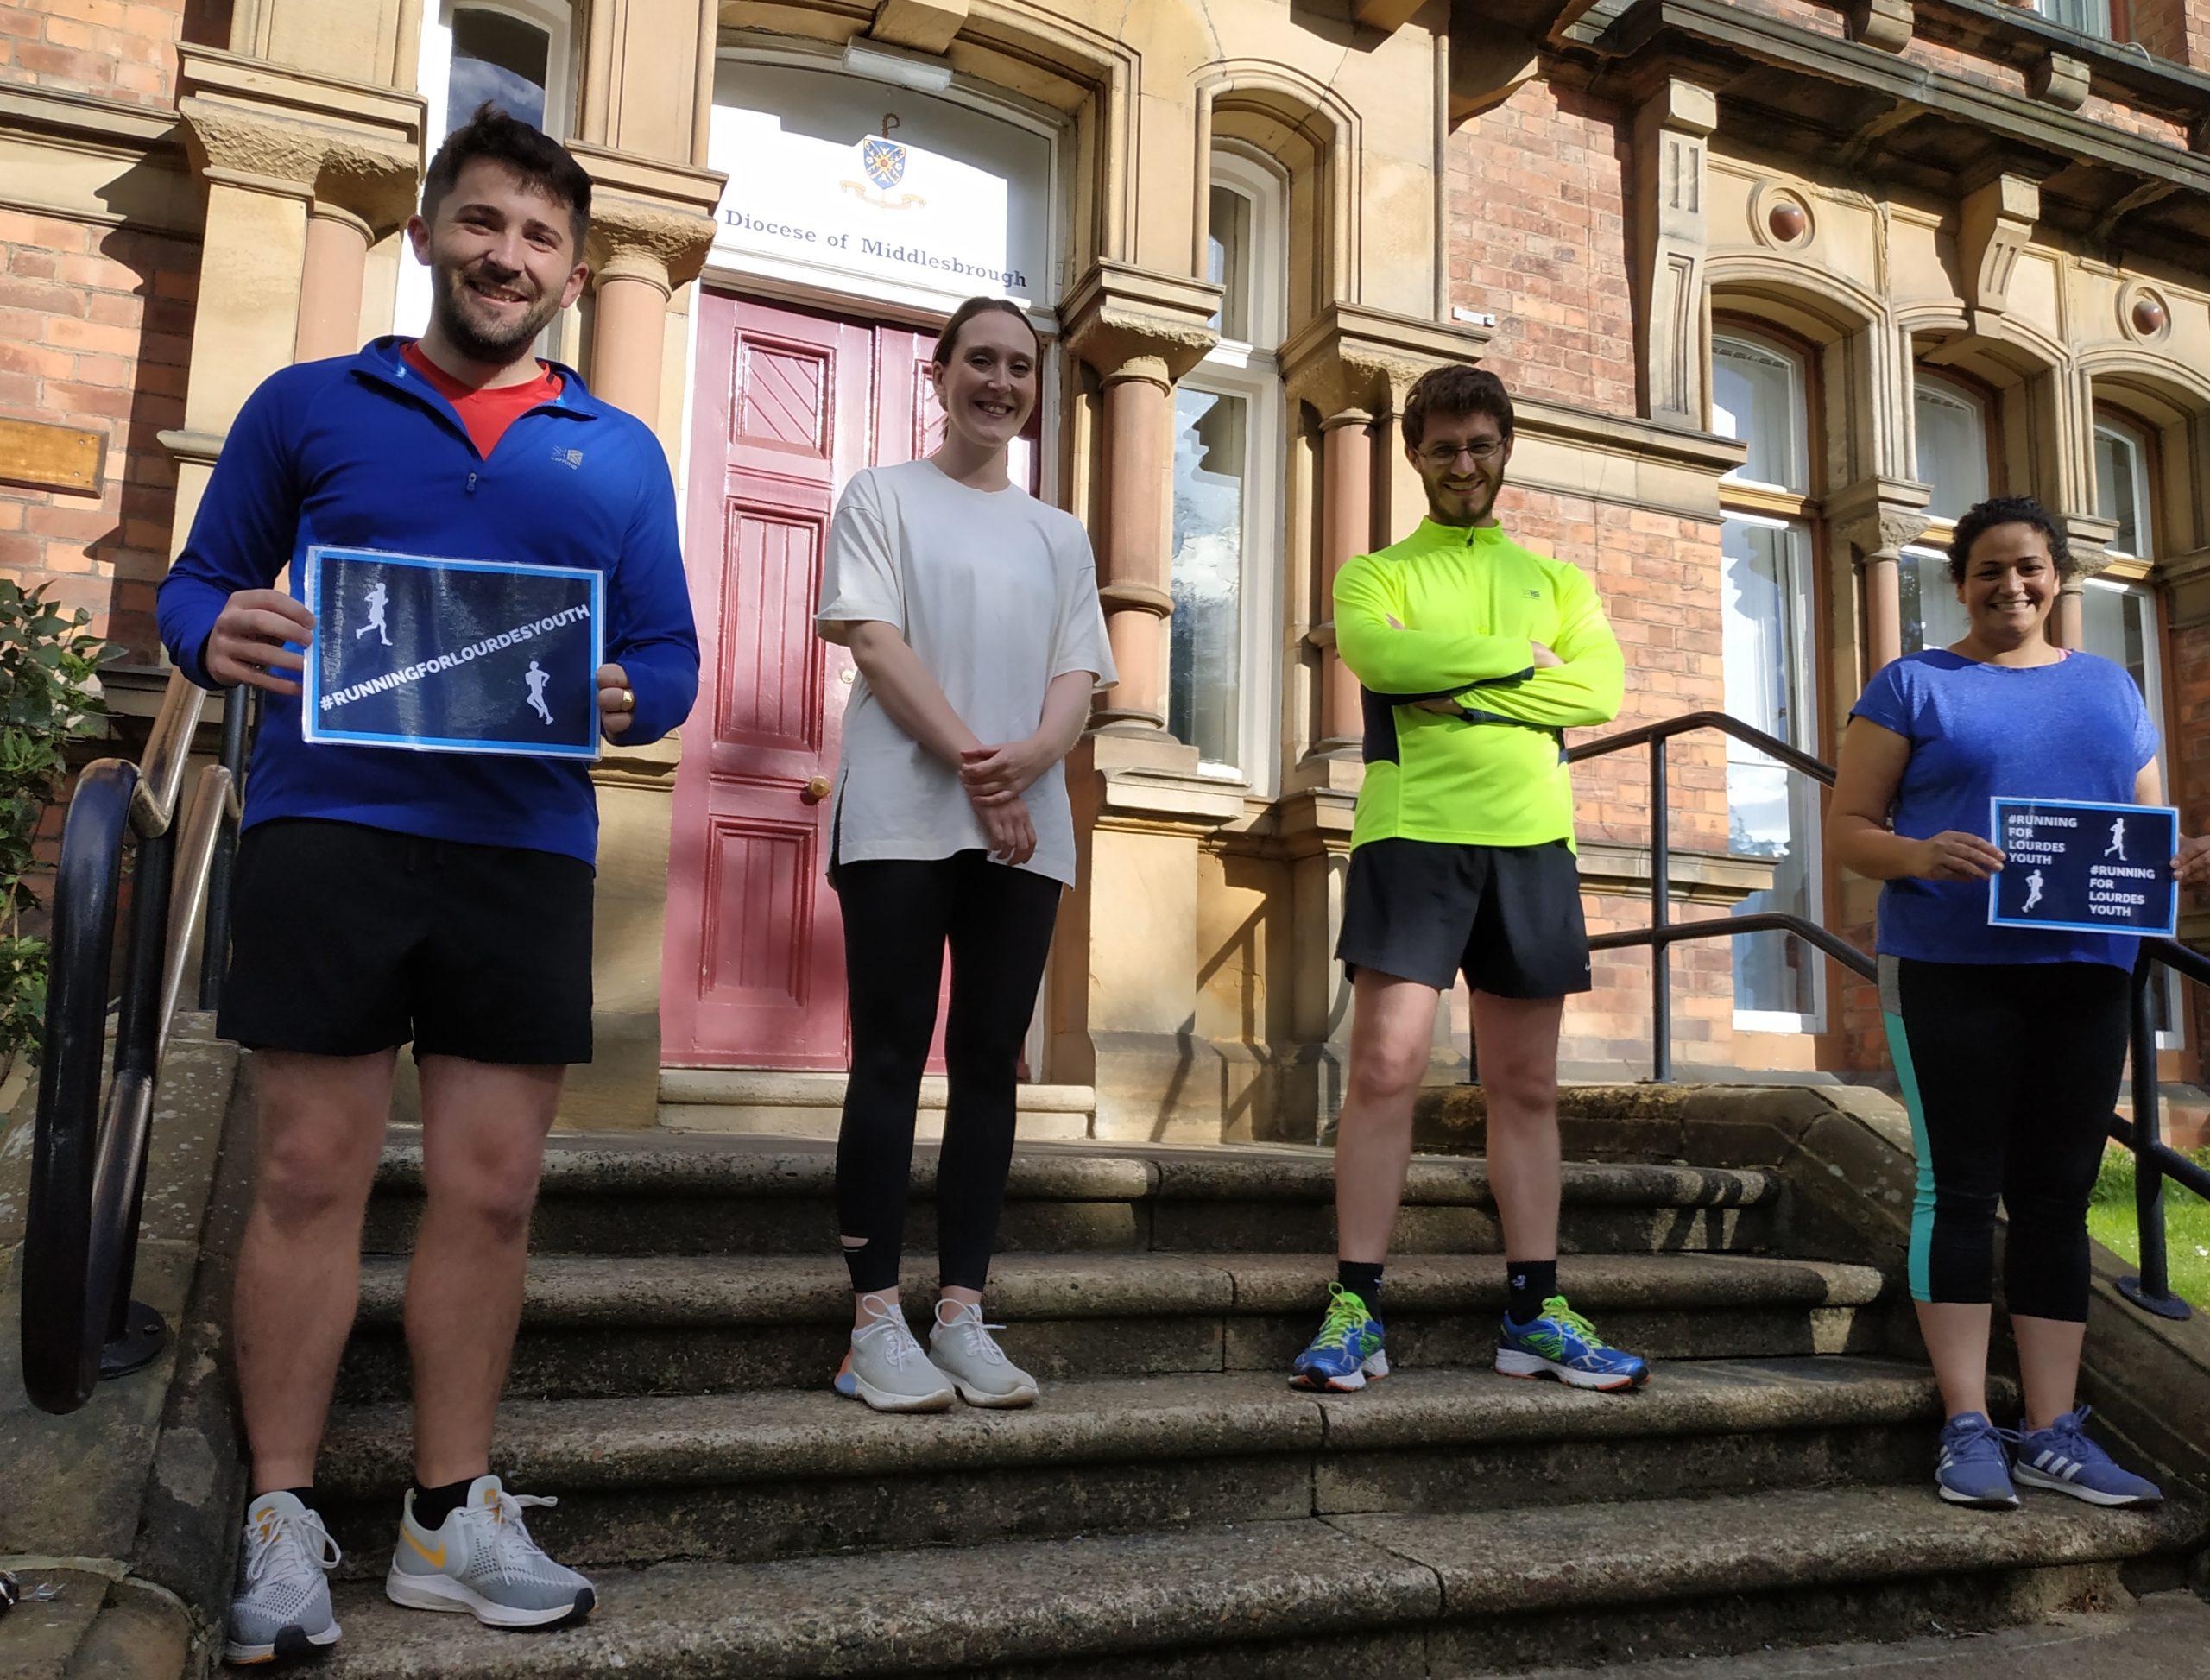 Lourdes runners Chris Lovell, Catherine Kelly, Father Phil Cunnah and Liz Jayasuriya